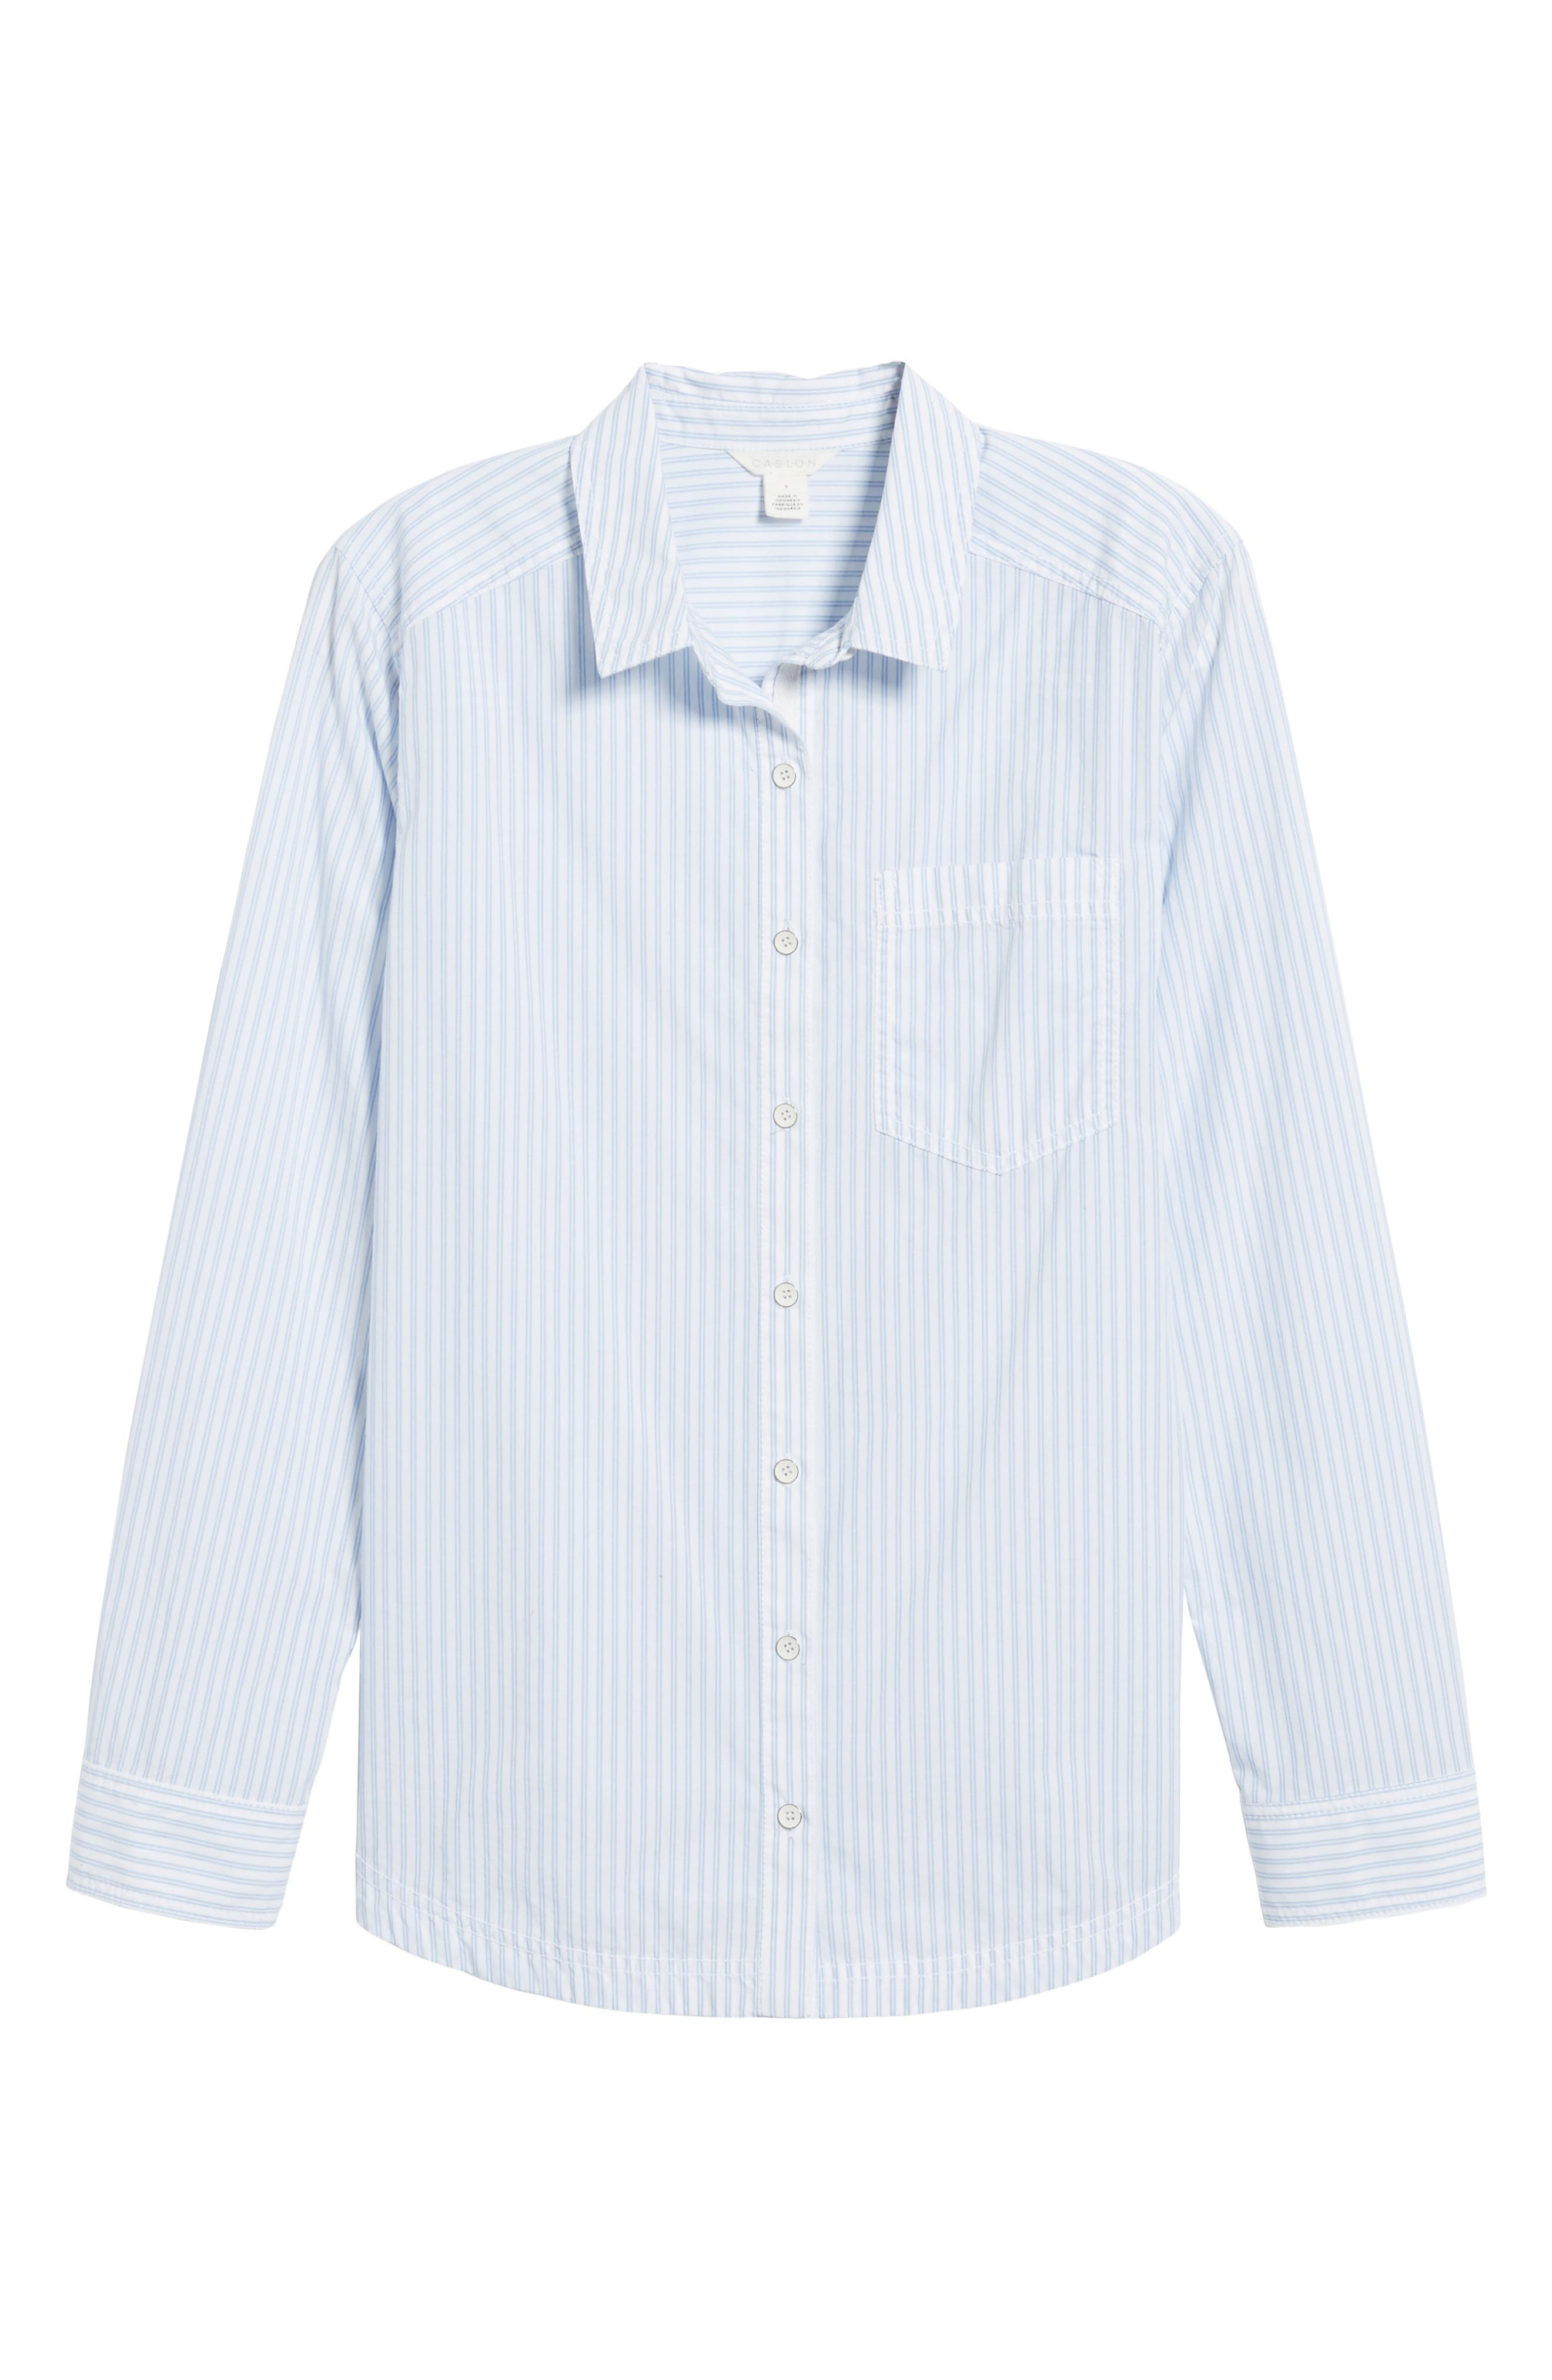 Button Front Pocket Shirt,                             Alternate thumbnail 6, color,                             White- Blue Stripe